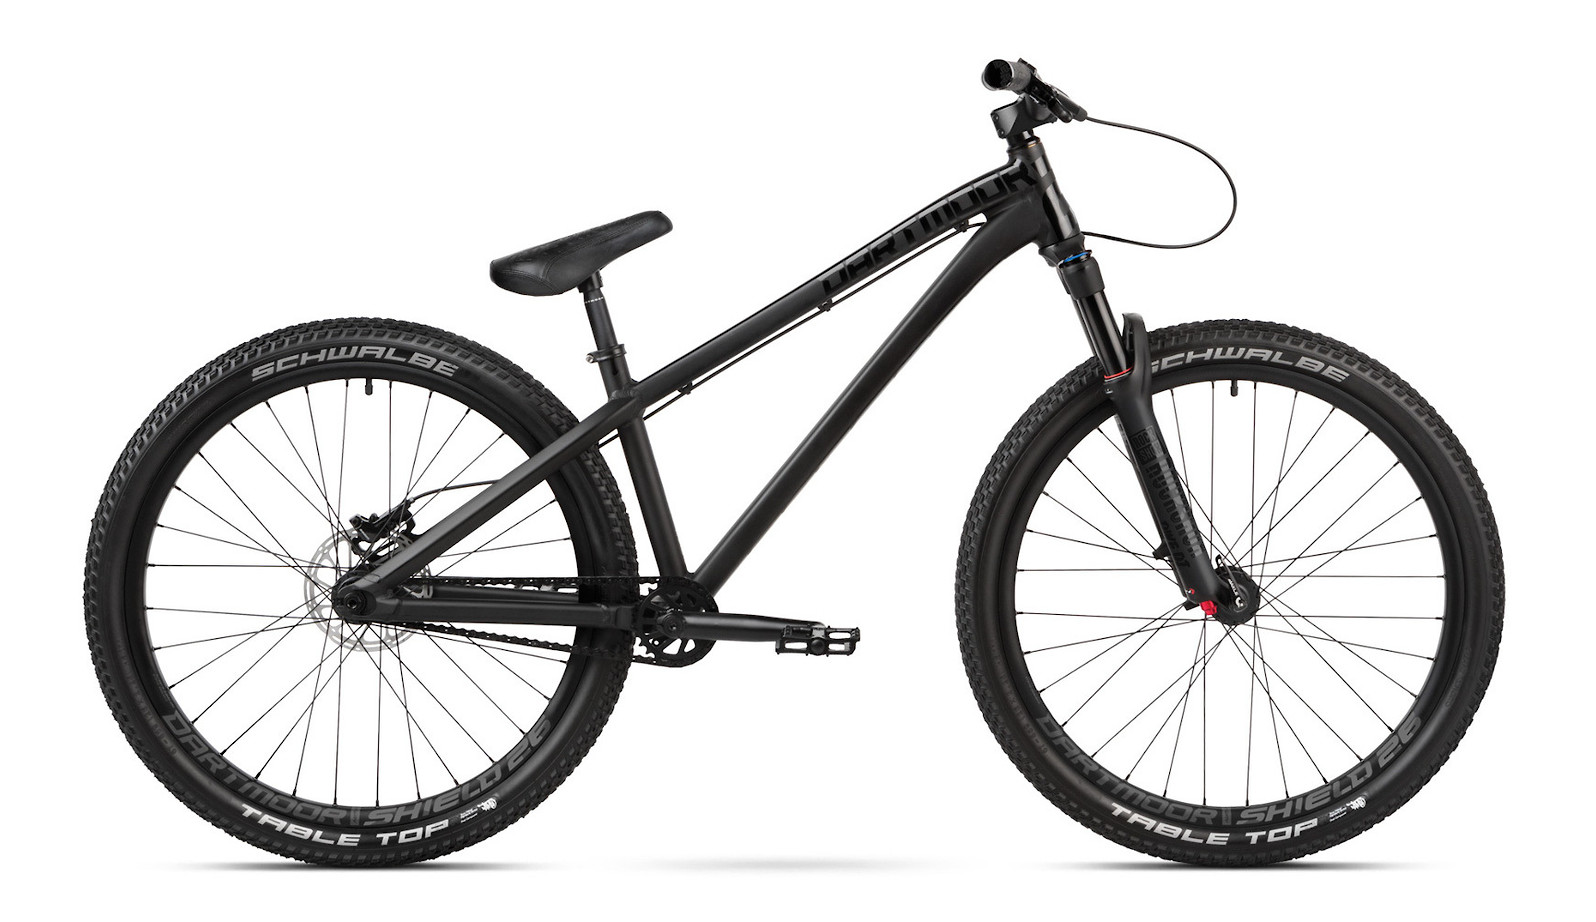 2019 Dartmoor Two6Player Pro Bike